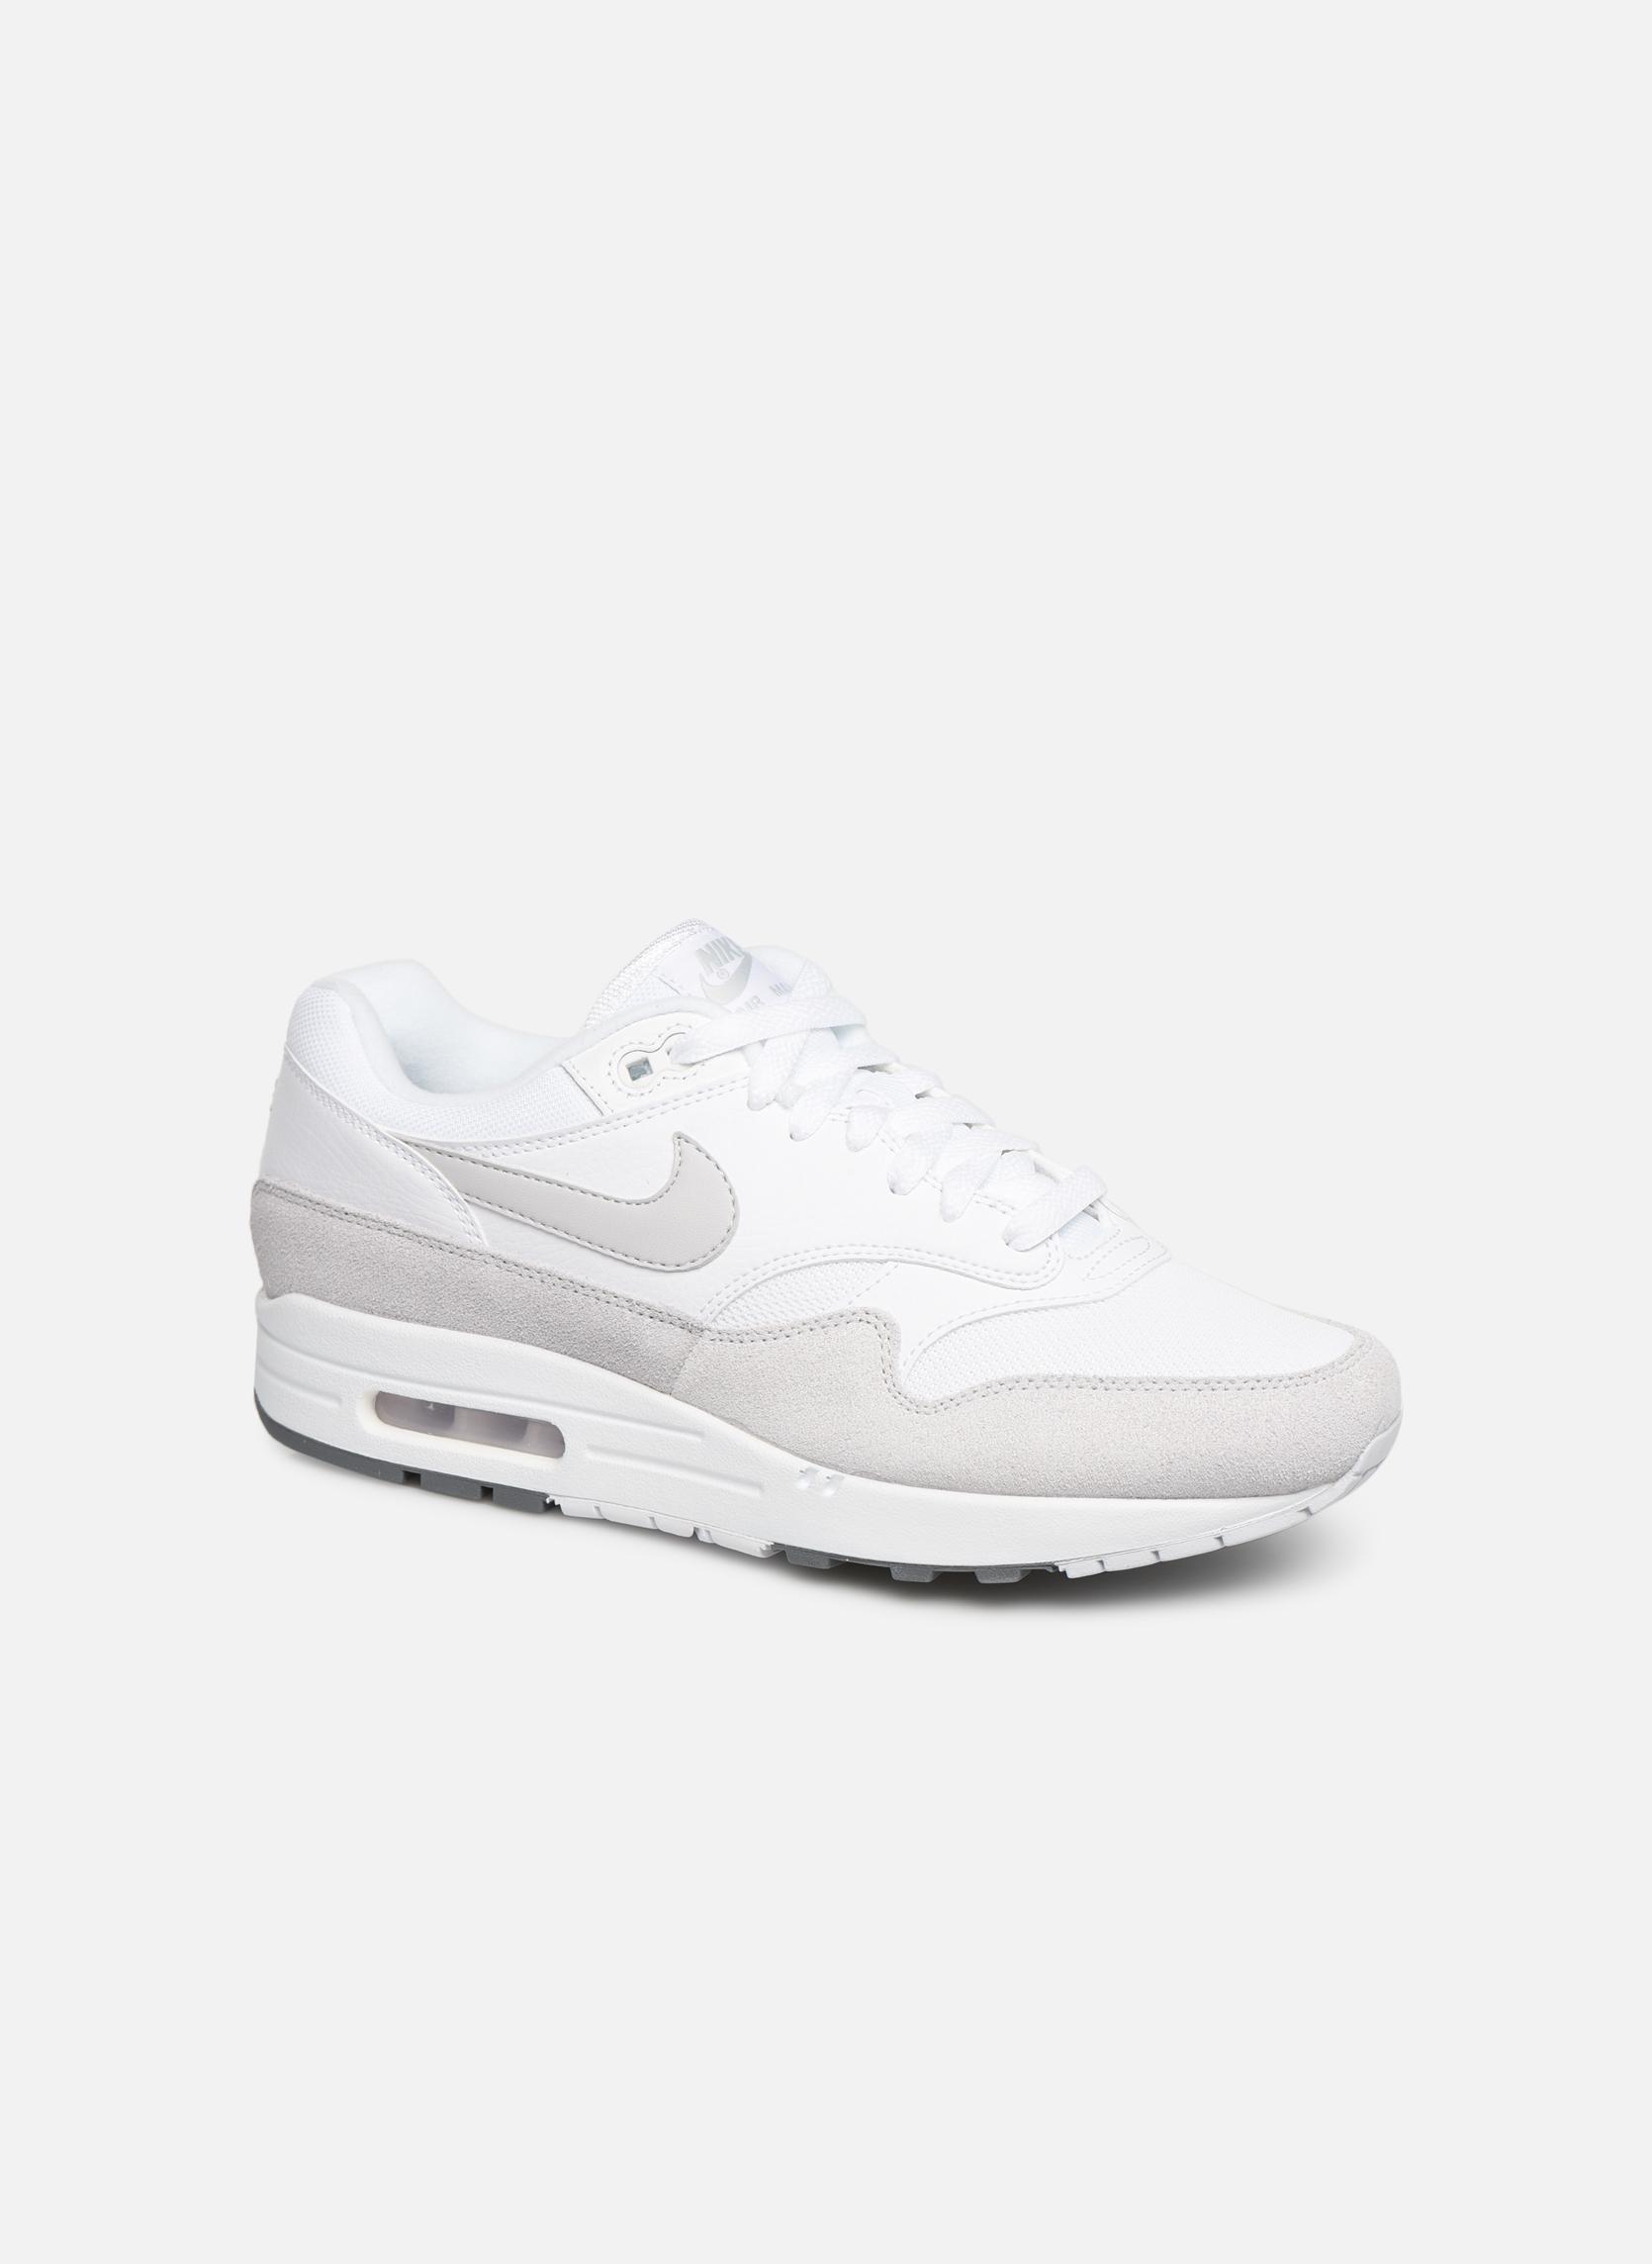 Sneakers Nike Air Max 1 by Nike